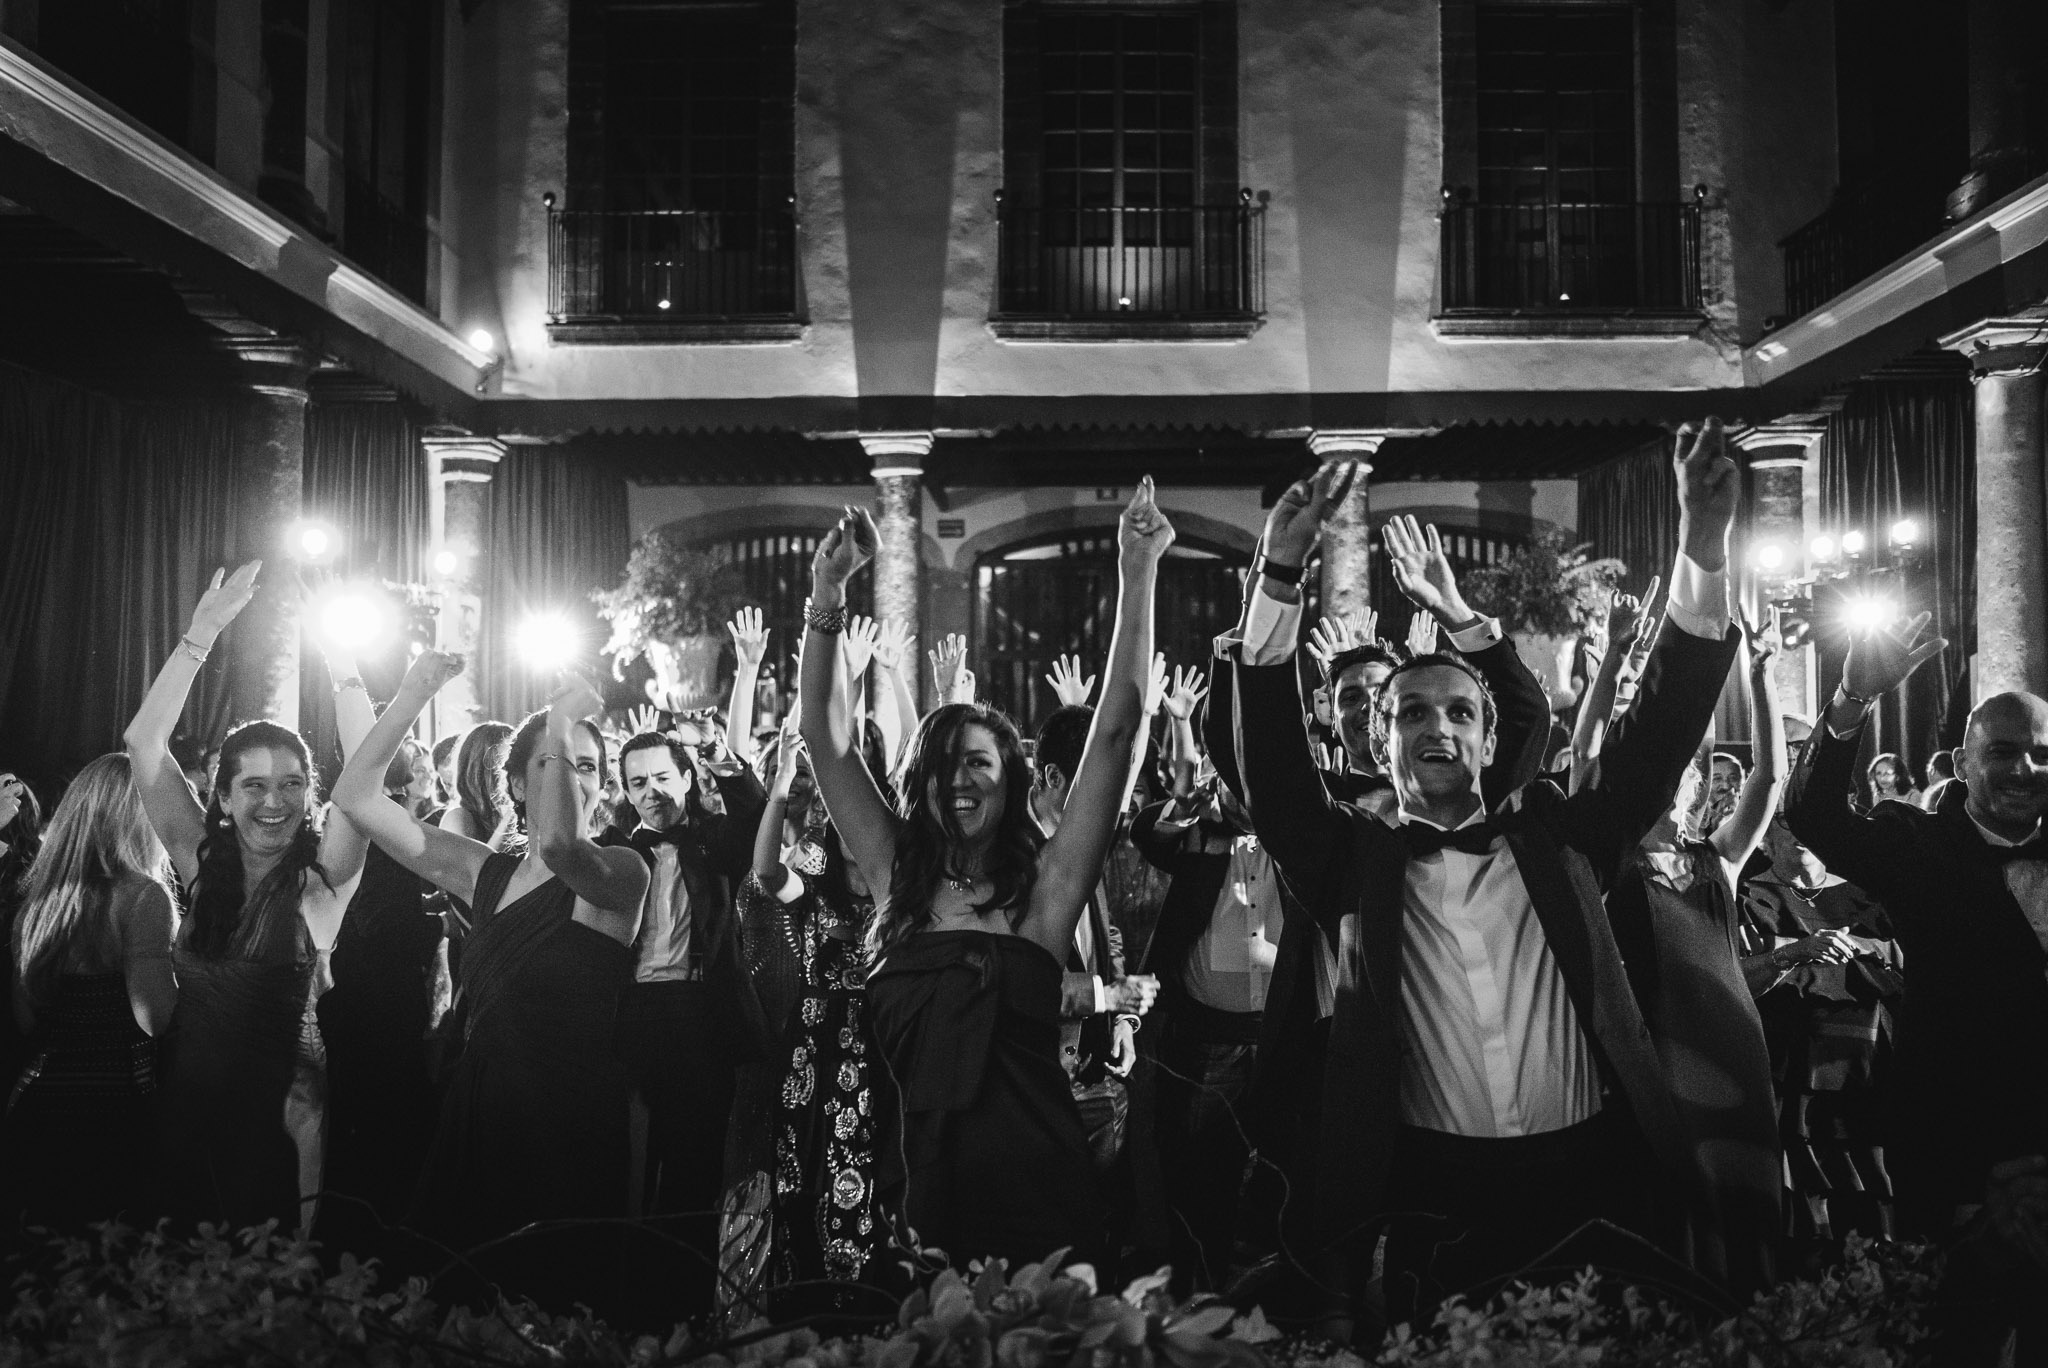 ©www.mauriziosolisbroca.com-20161002maurizio-solis-broca-mexico-canada-wedding-photographer20161002DSC05584-Edit.jpg